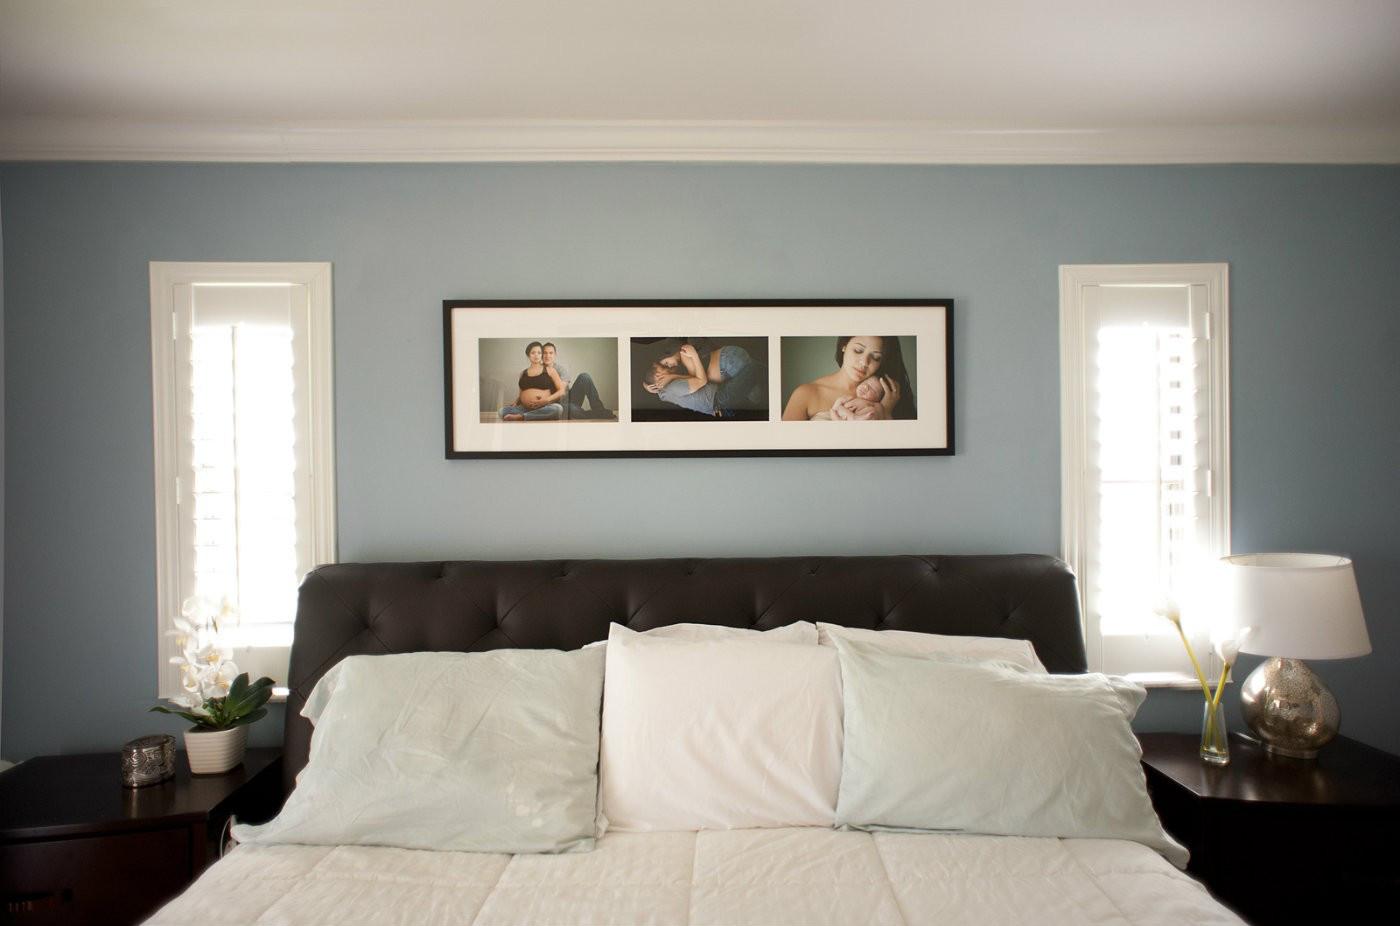 Stylish Master Bedroom Decorating Ideas - Interior Design ... on Bedroom Wall Decor  id=19386